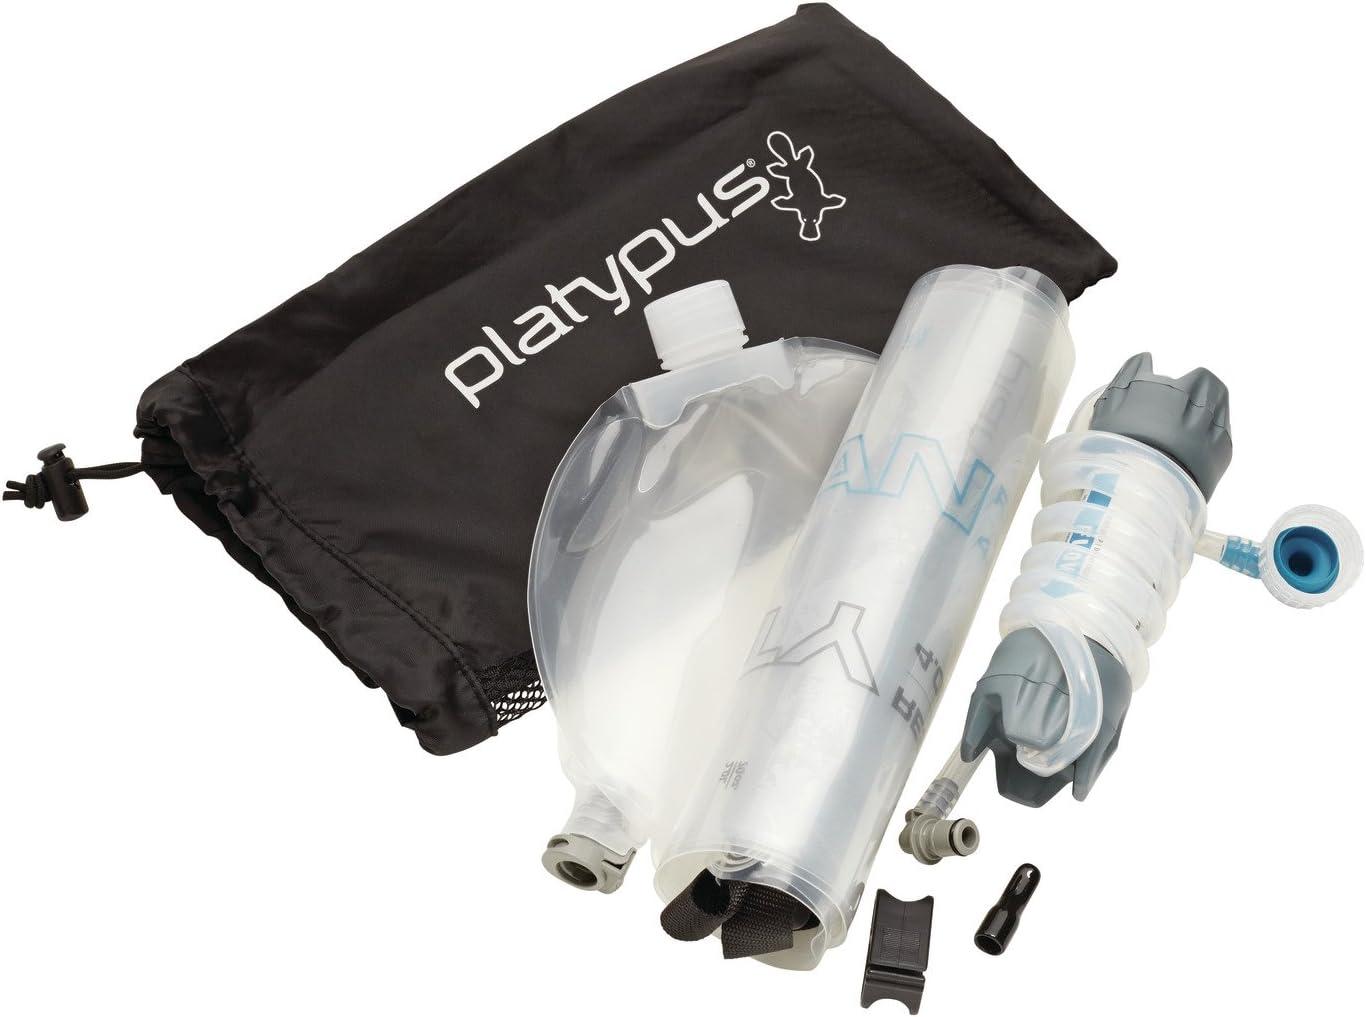 Platypus water filter